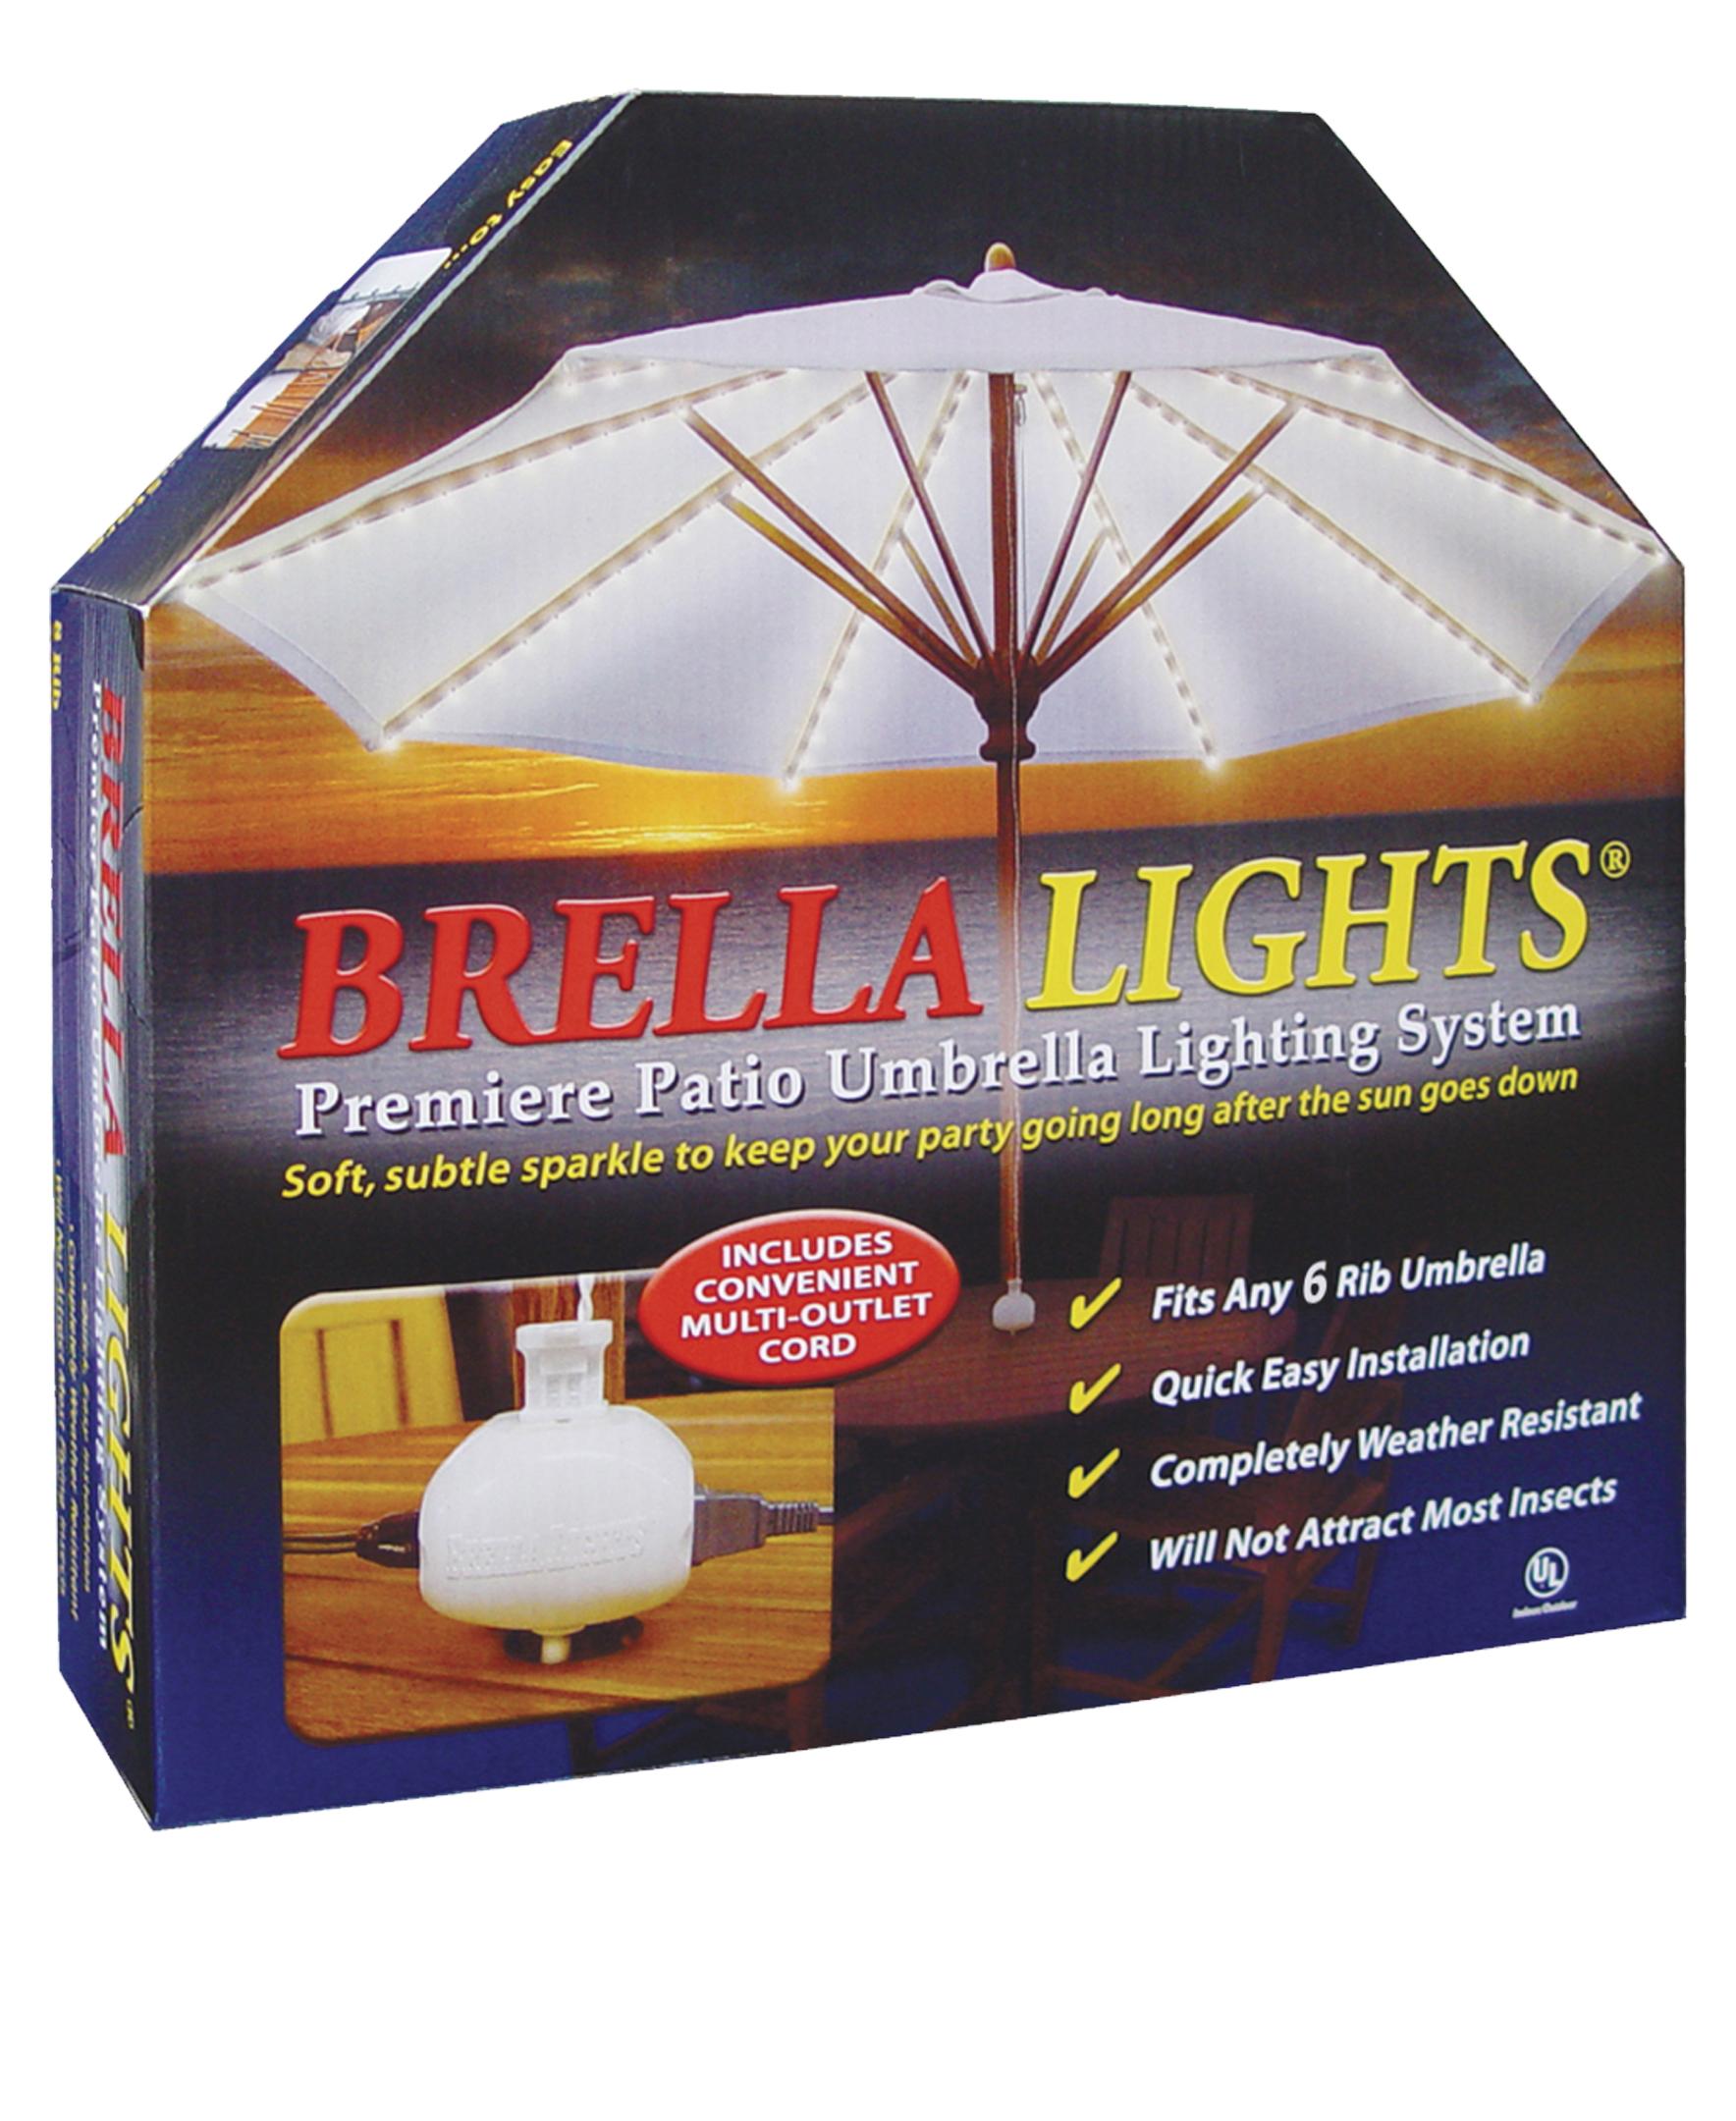 Blue Star Group Brella Lights - Patio Umbrella Lighting Syst